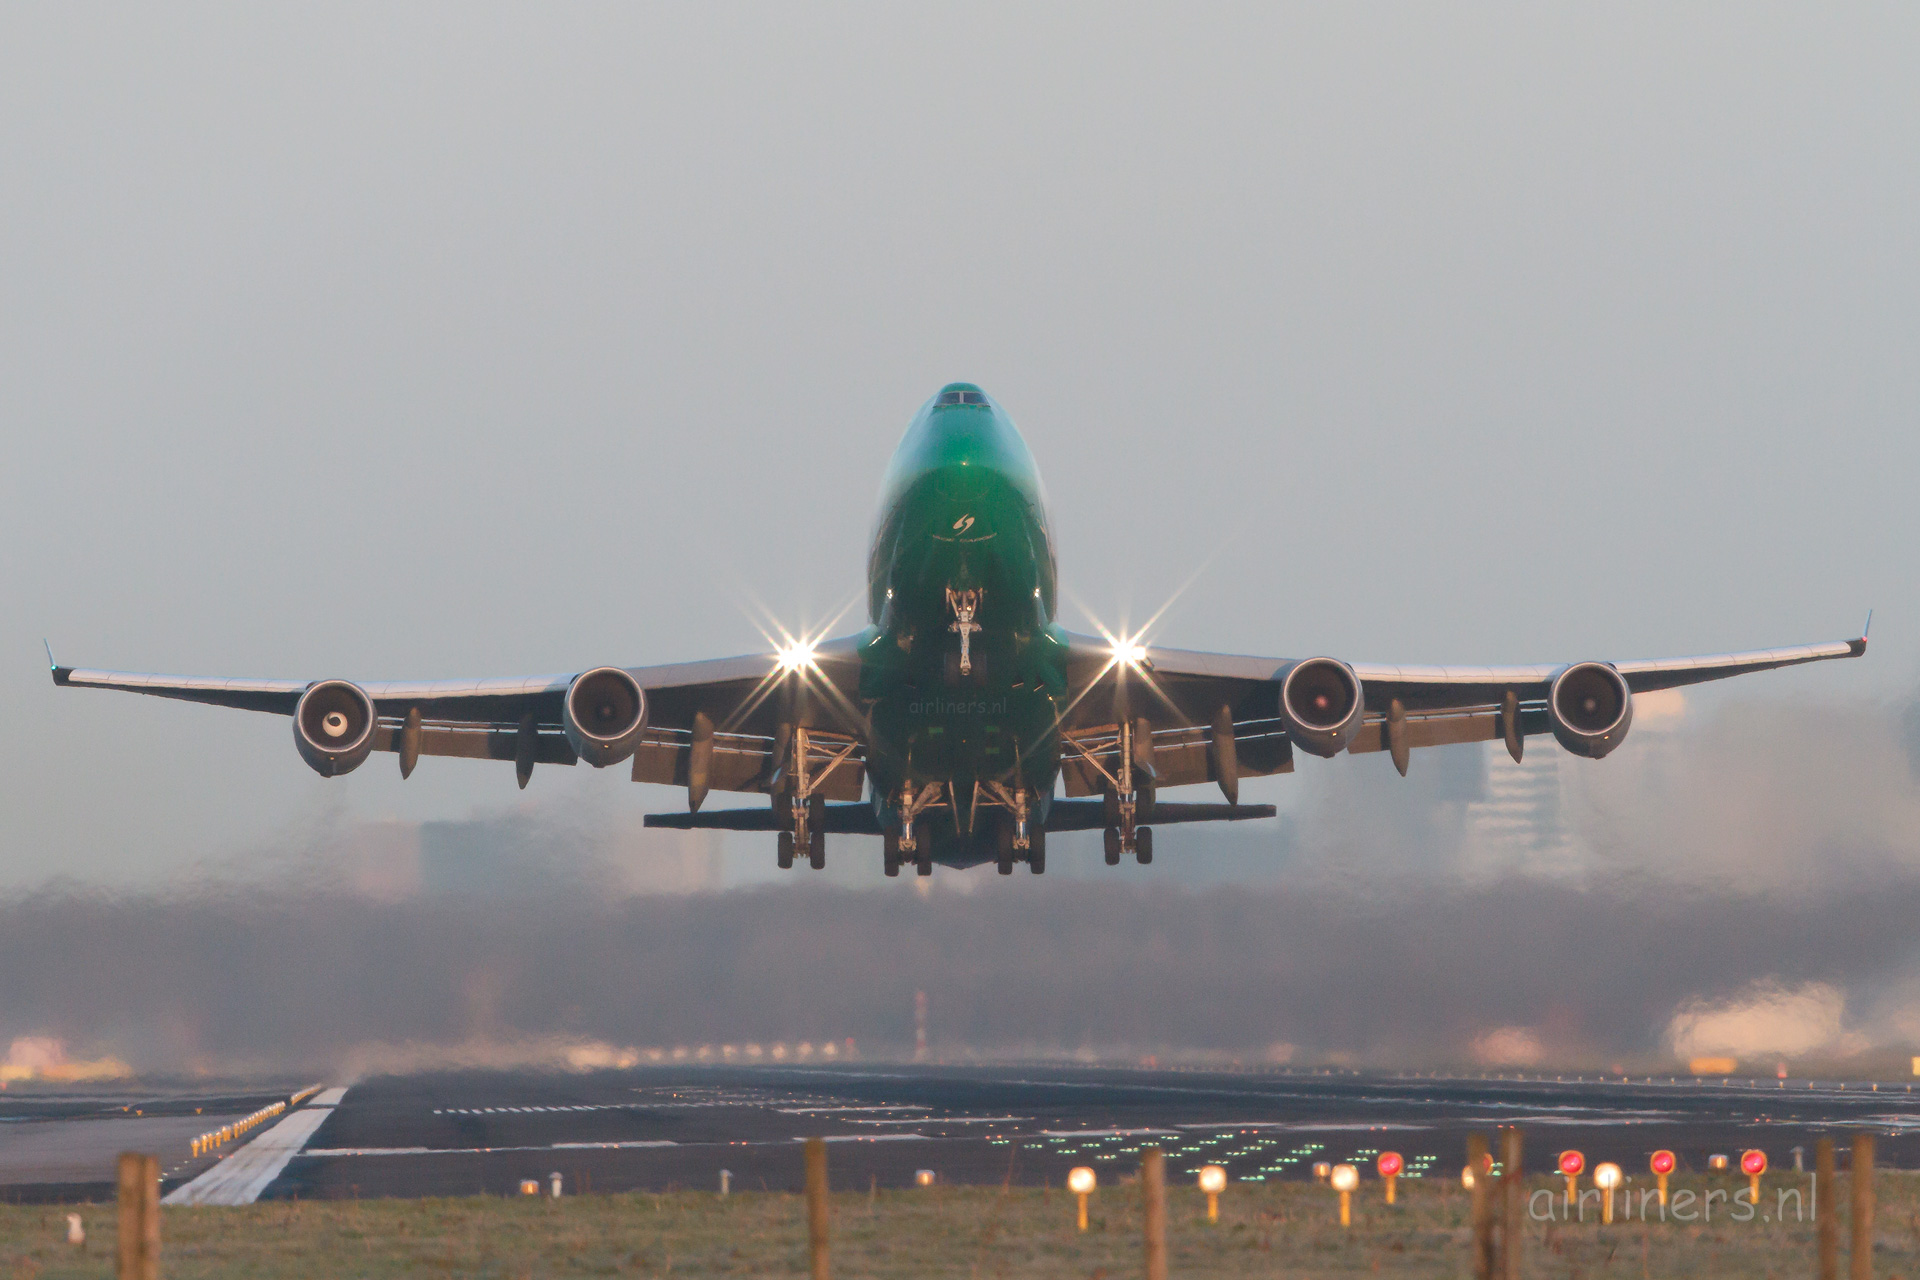 Dagje uit op luchthaven Airport Schiphol